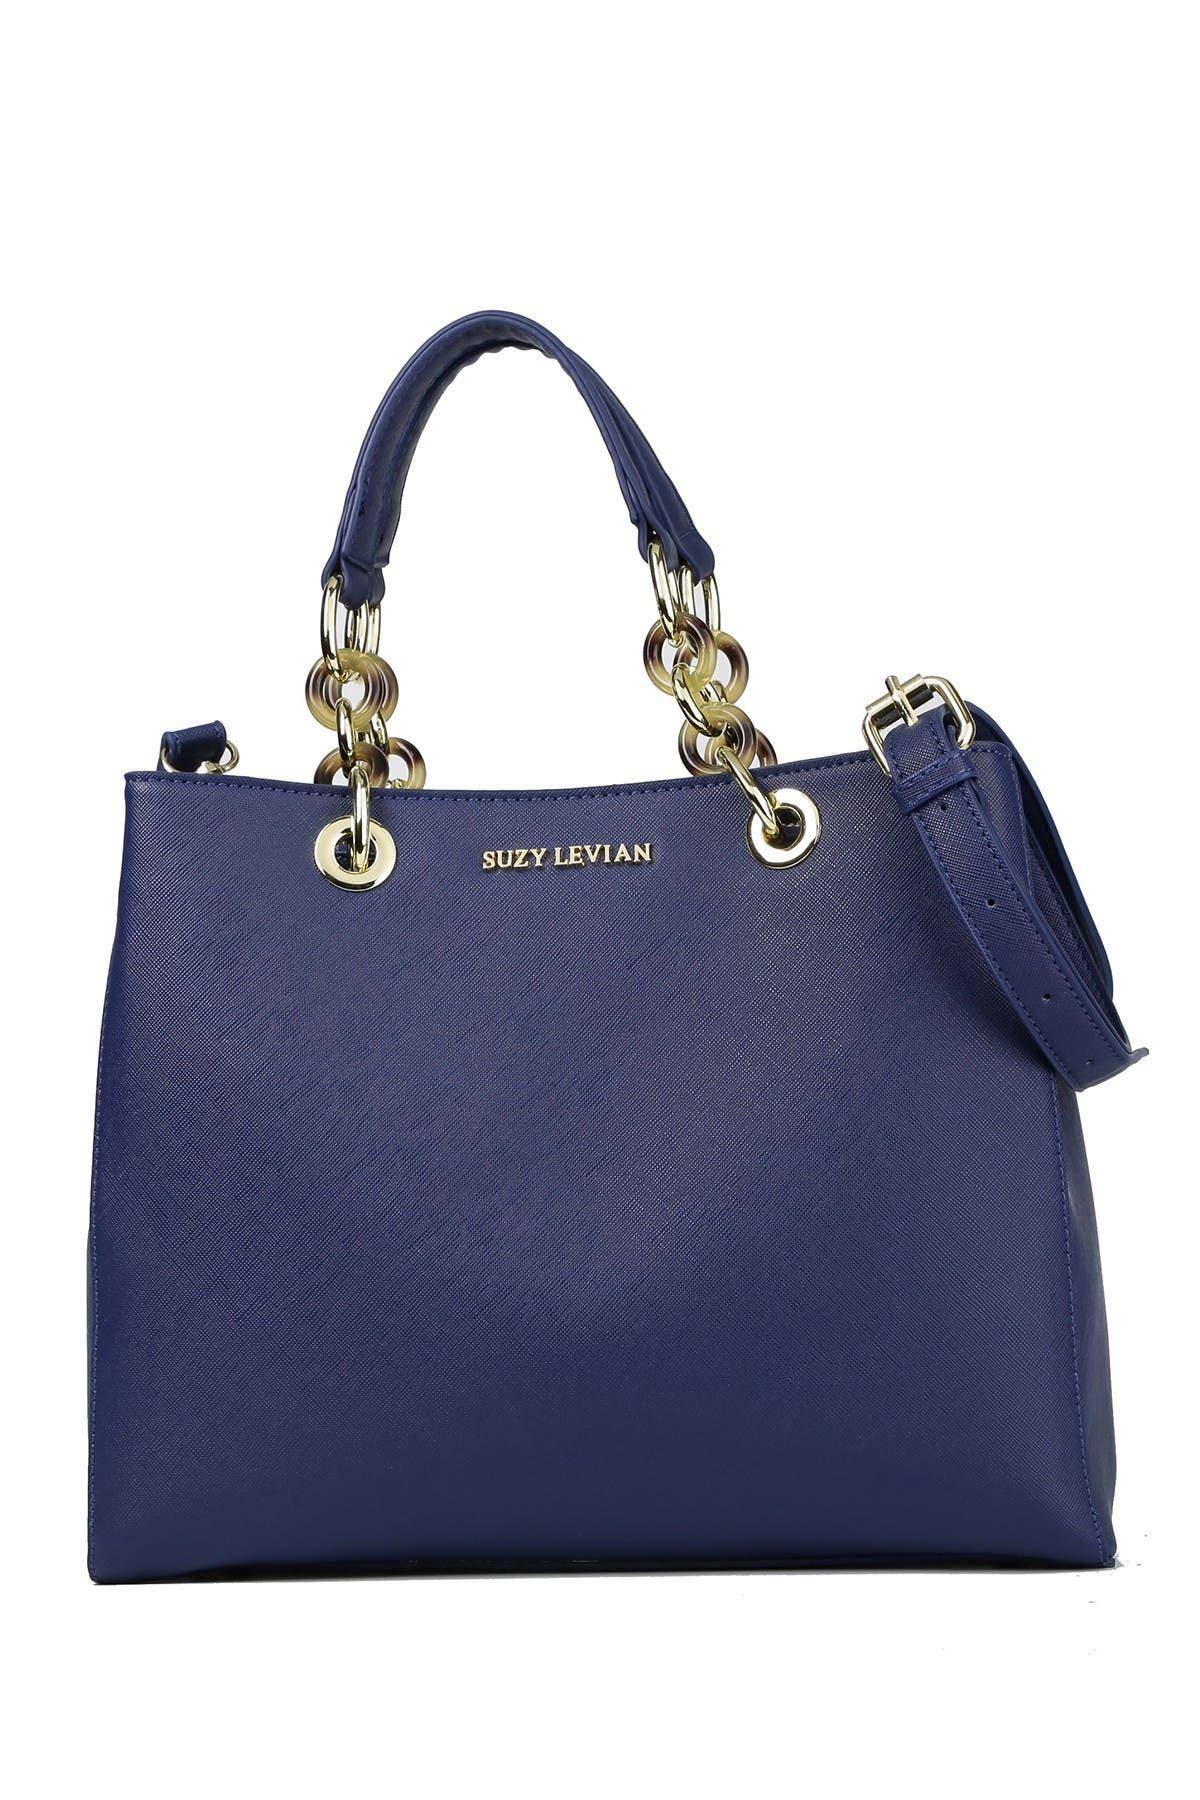 Image of Suzy Levian Saffiano Faux Leather Chain Strap Satchel